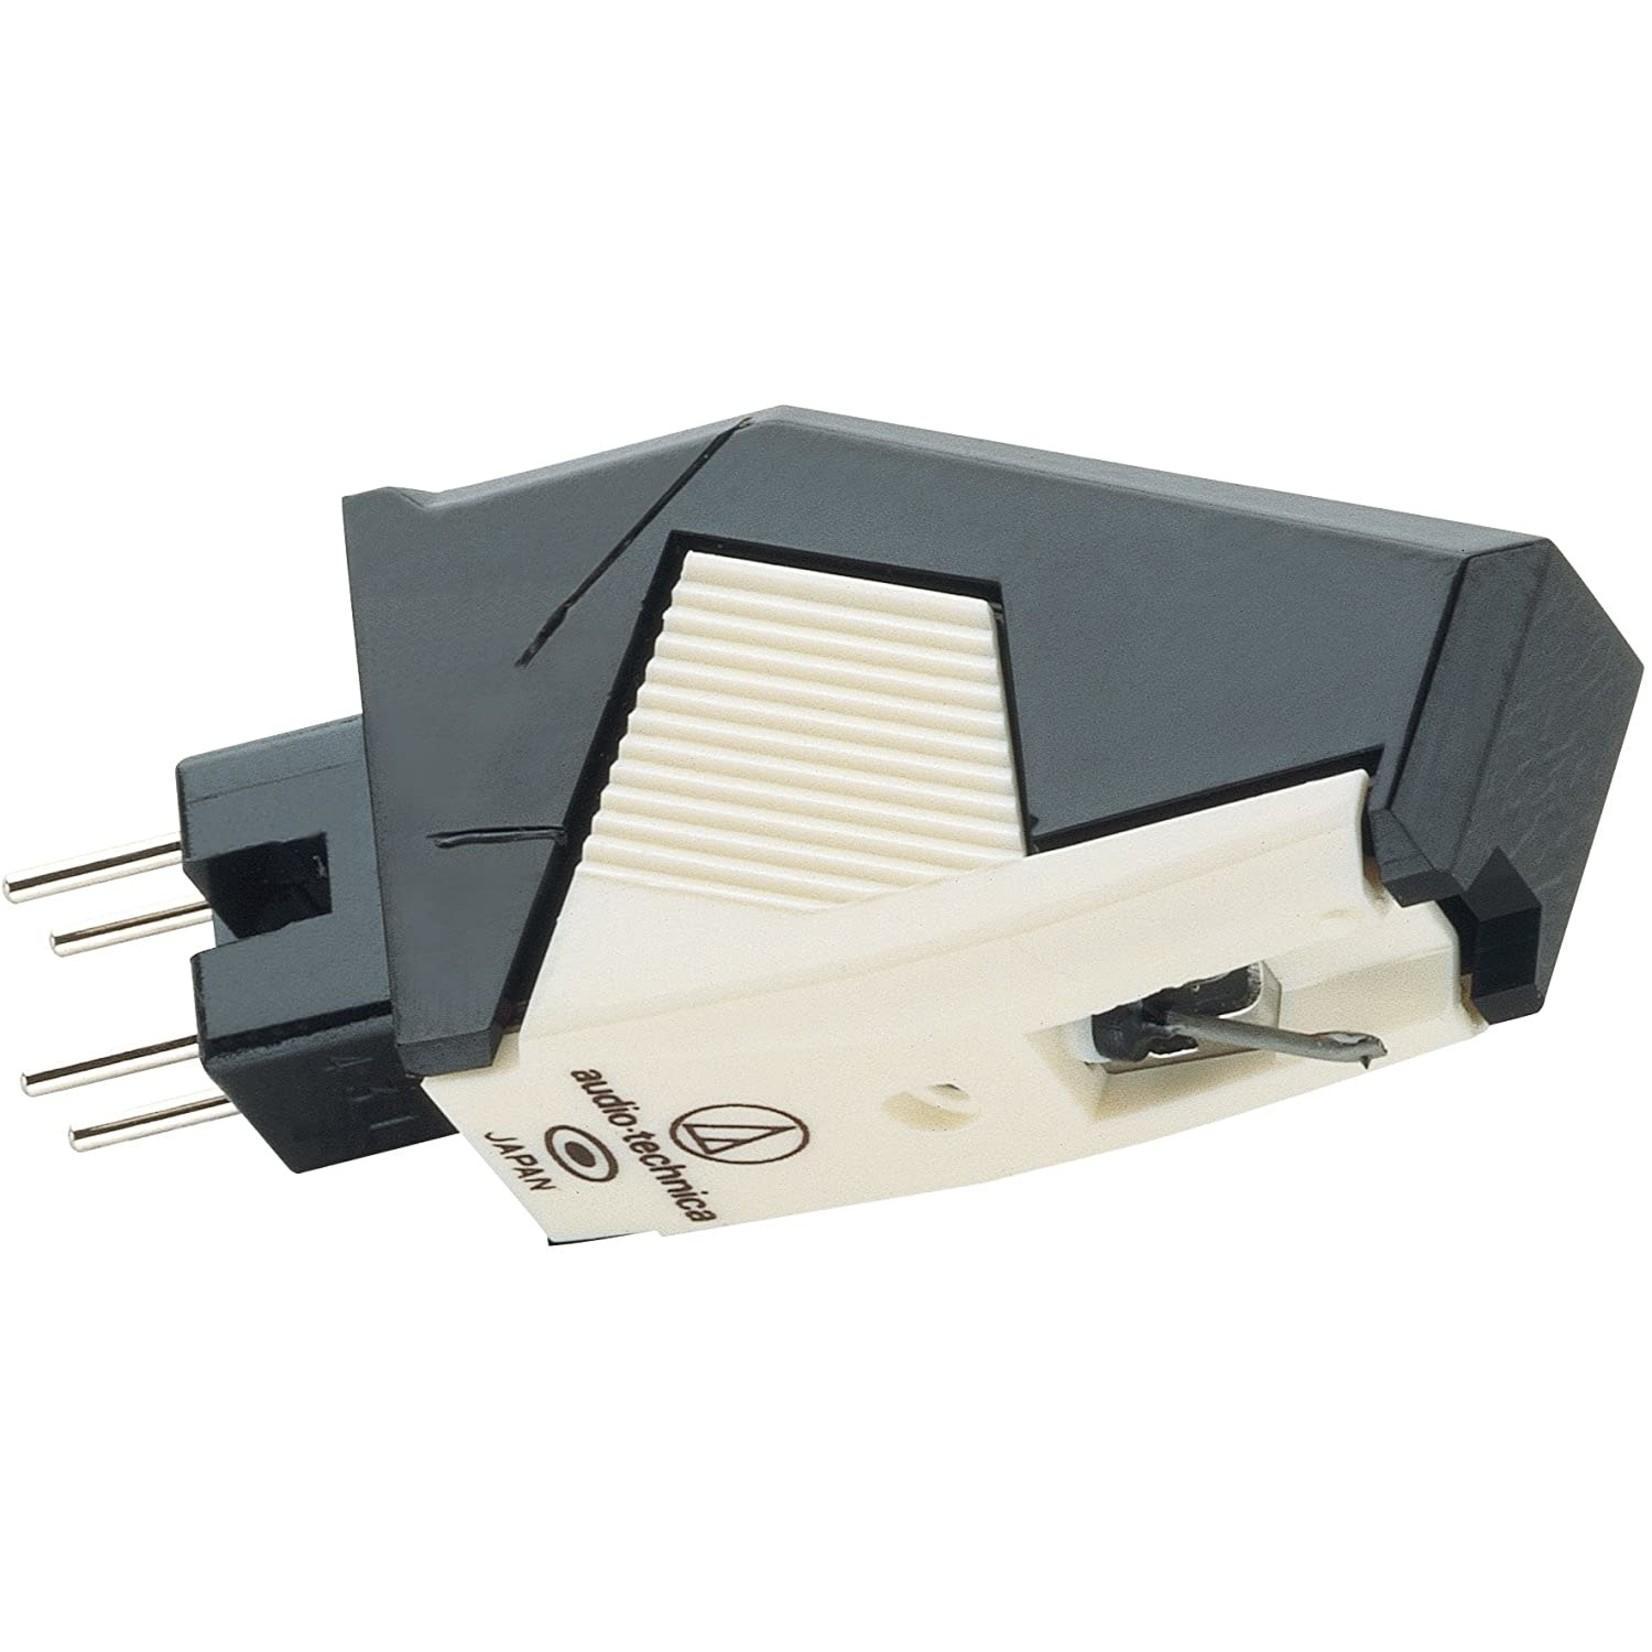 Accessory Audio Technica Audio-Technica AT311EP Universal Mount Turntable Phono Cartridge